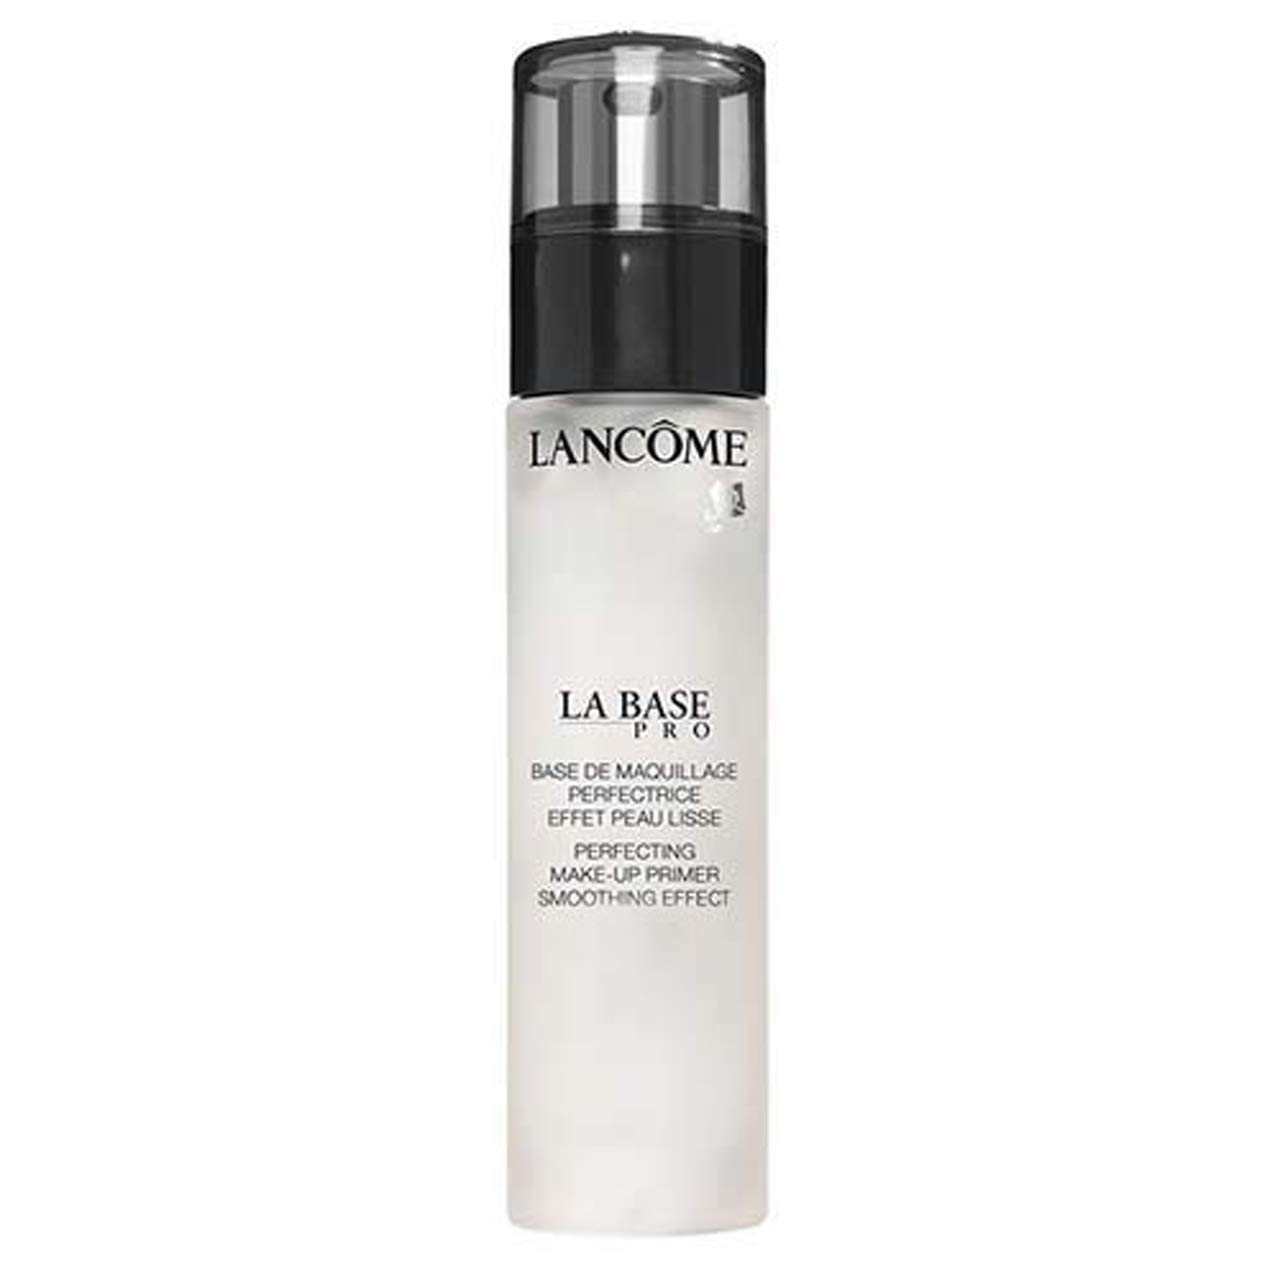 Lancome La Base Pro Perfecting Makeup Primer, 0.8 Ounce